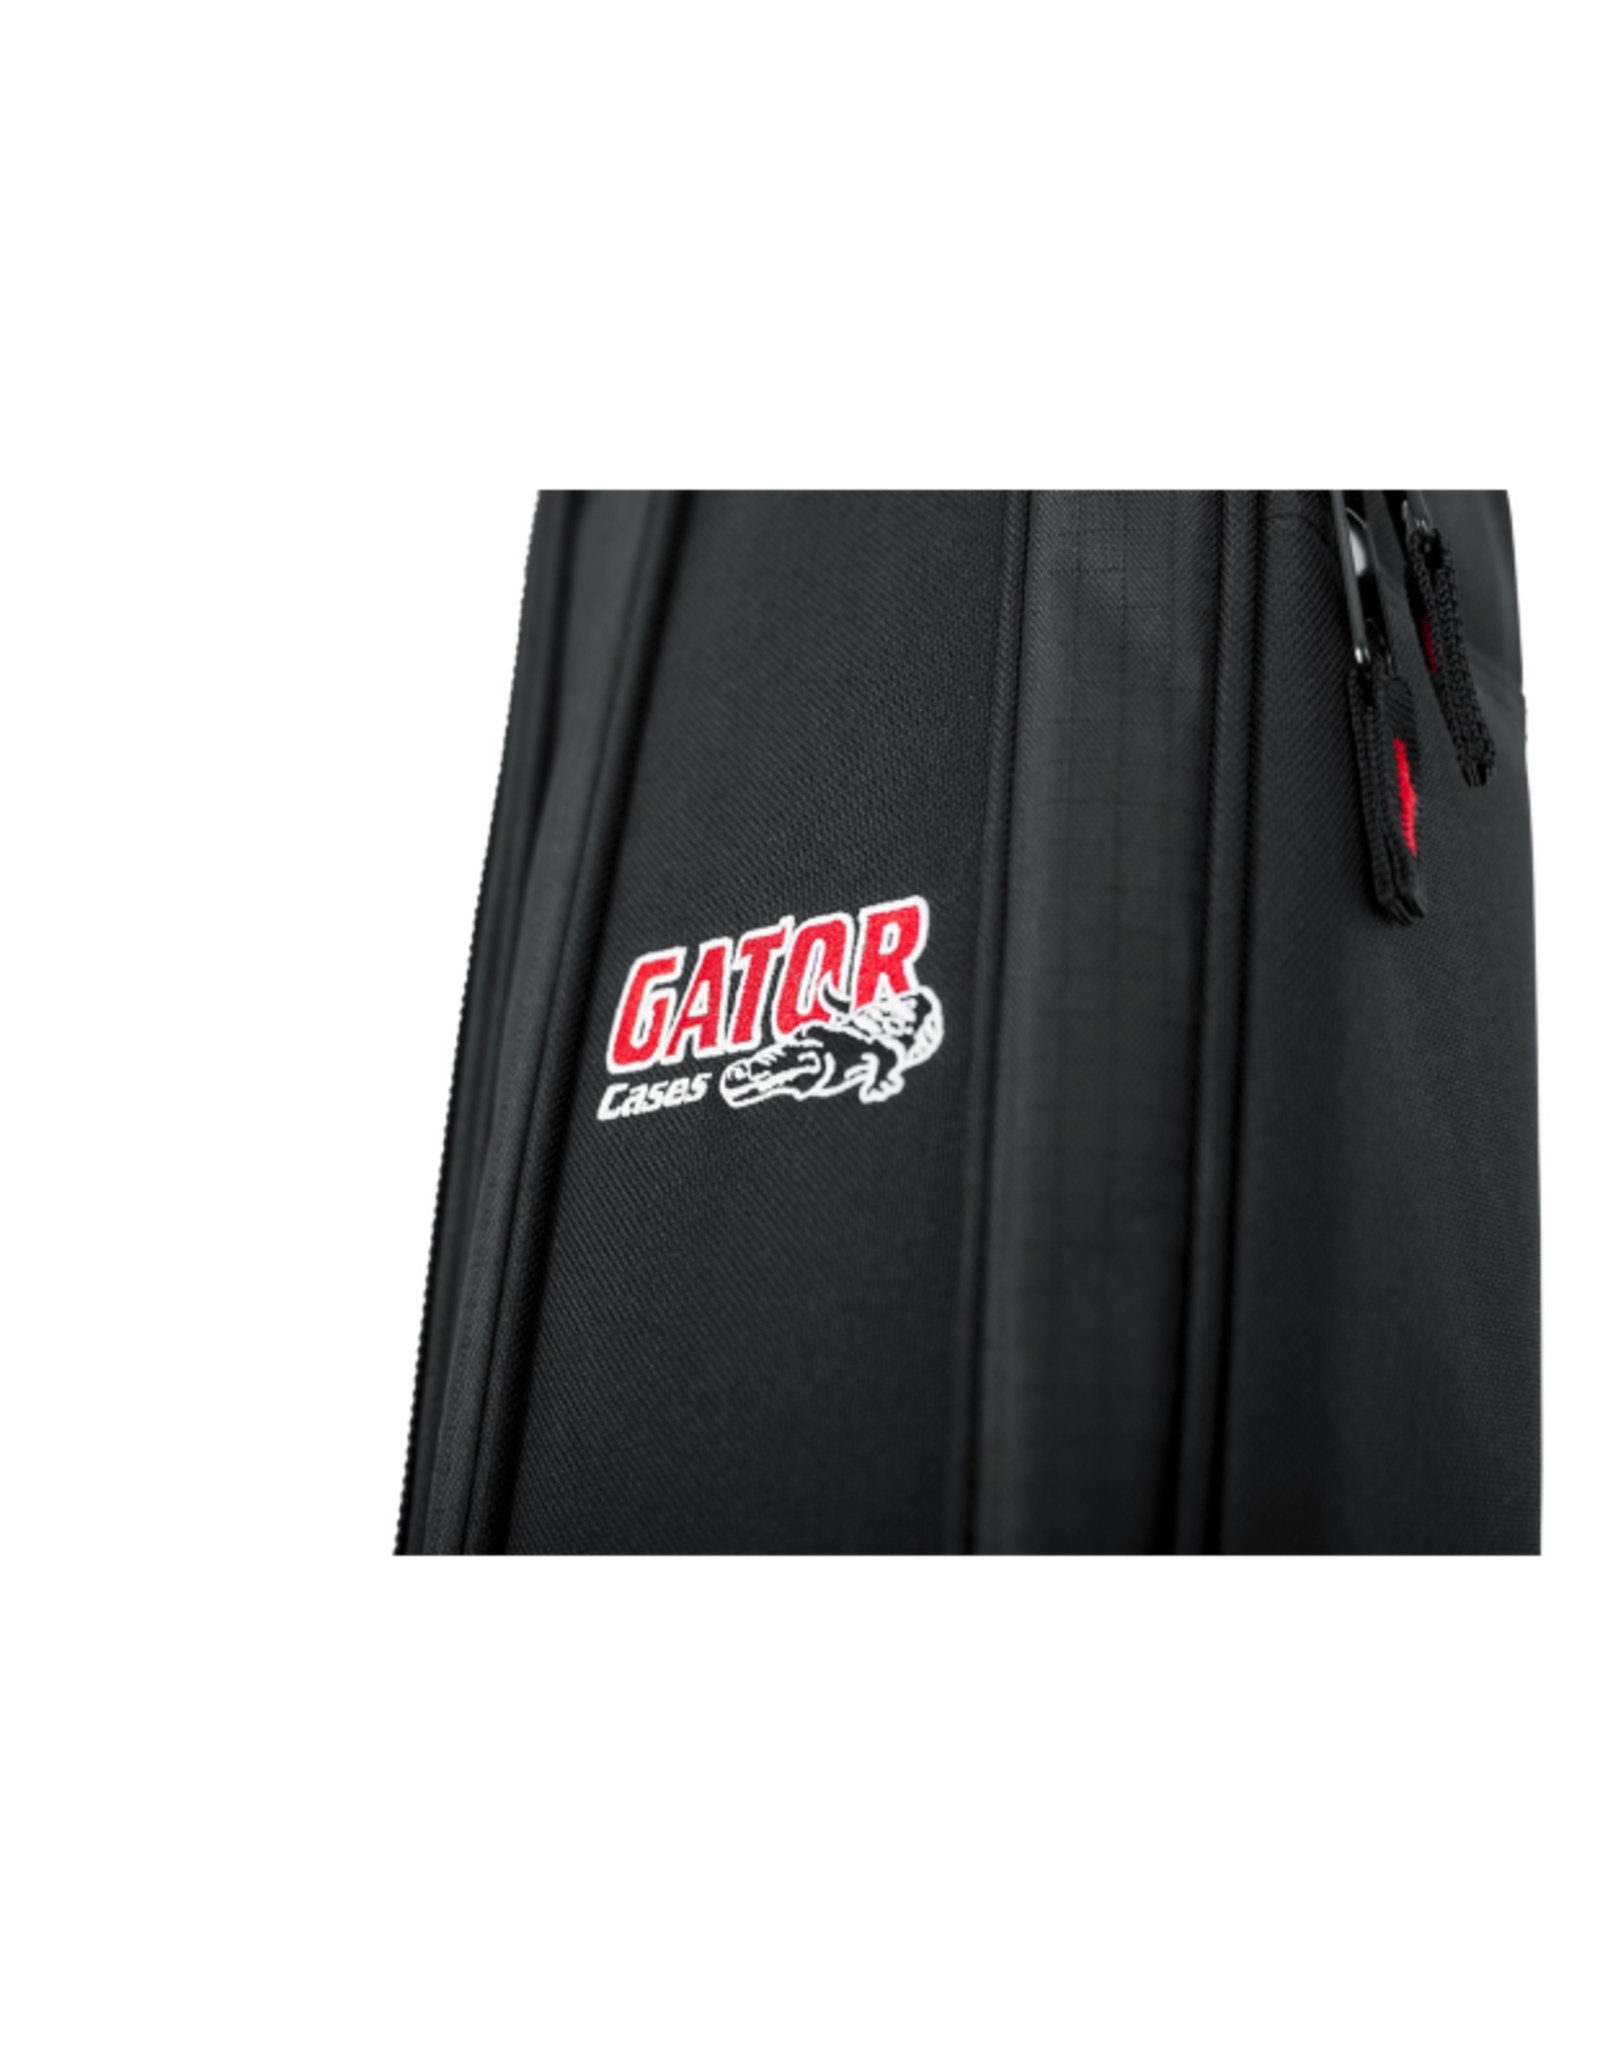 Gator Gator 4G SERIES Electric Guitar Gig Bag GB-4G-Electric